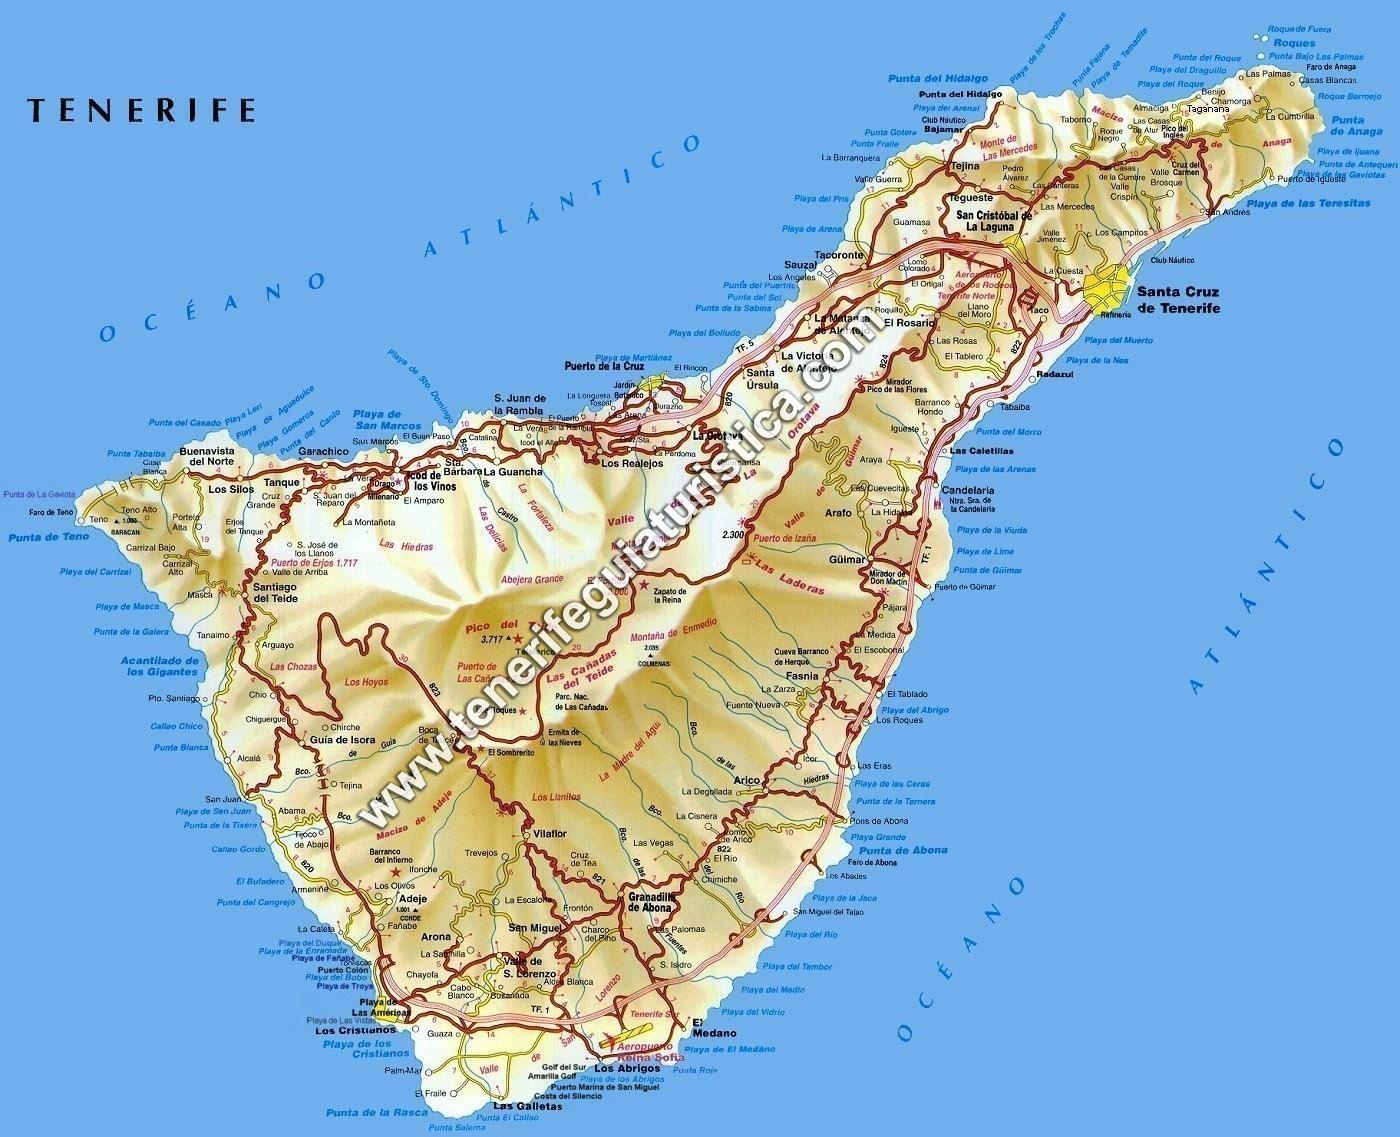 tenerife mapa Mapa de Tenerife   Islas Canarias tenerife mapa